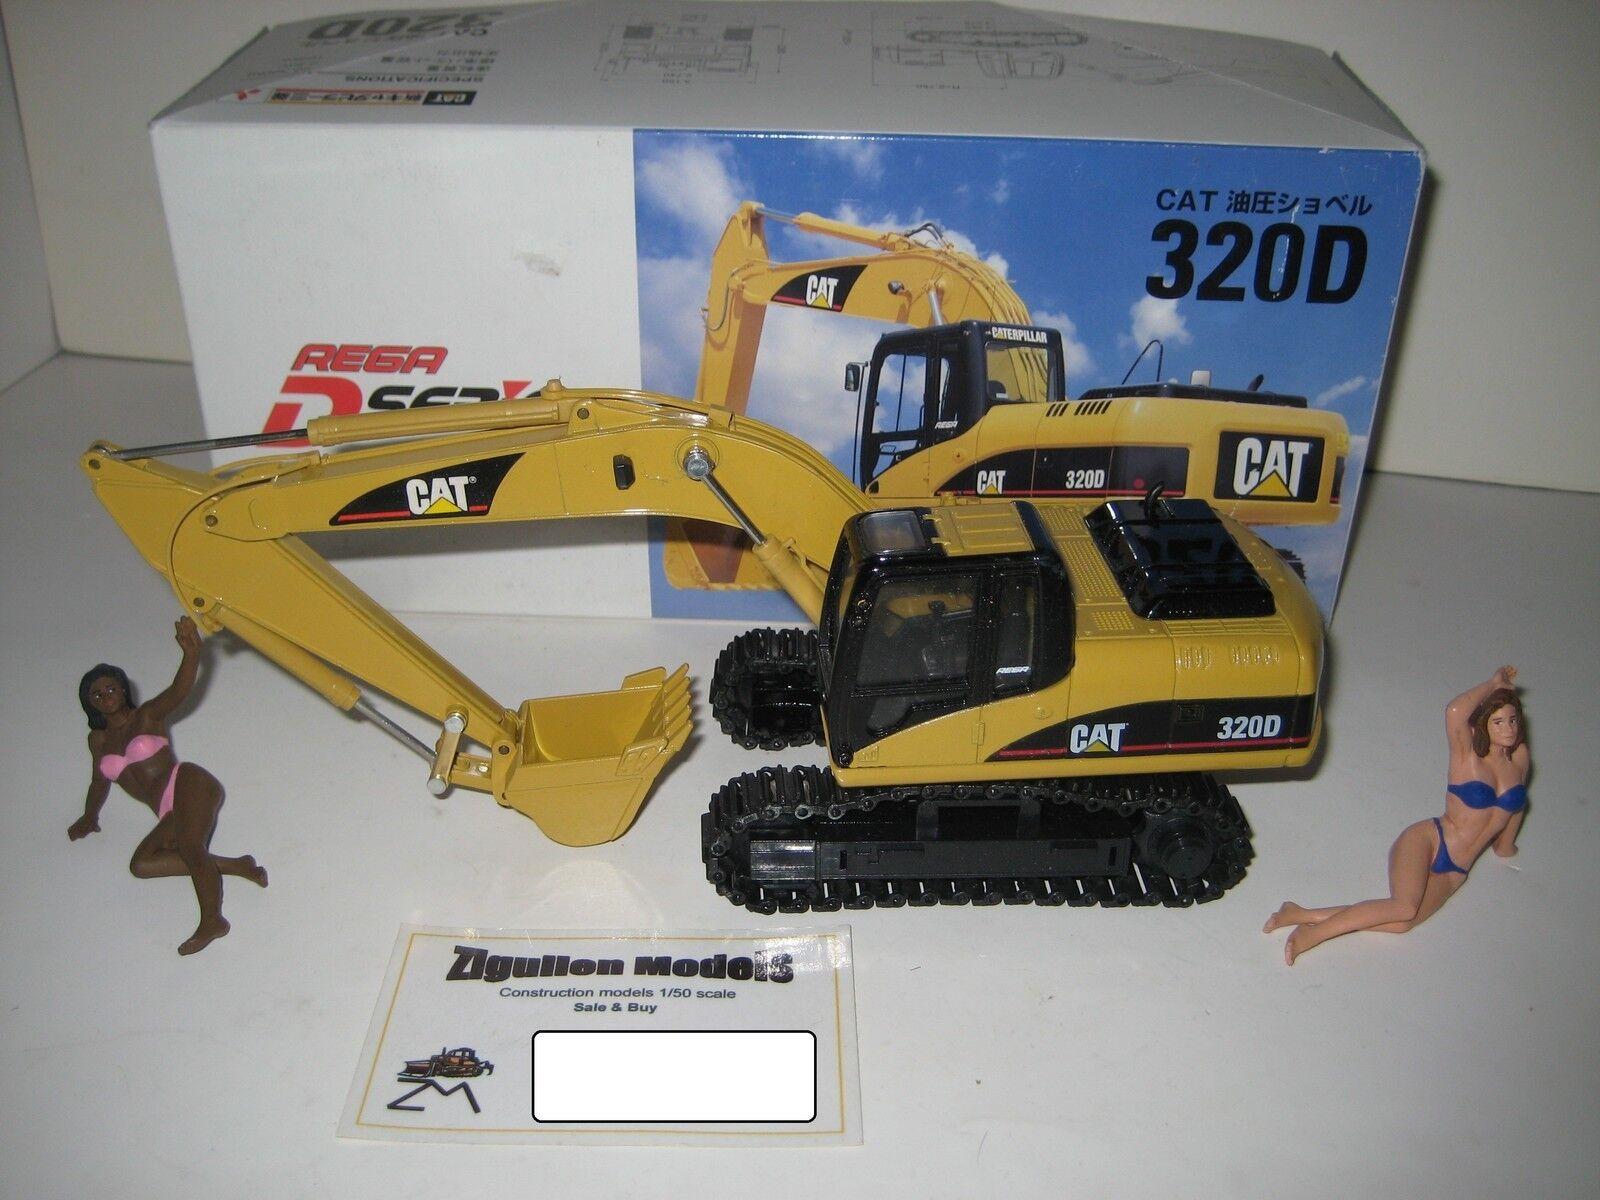 CATERPILLAR 320 D rega Excavateurs tieflöffel 1 40 neuf dans sa boîte RARE